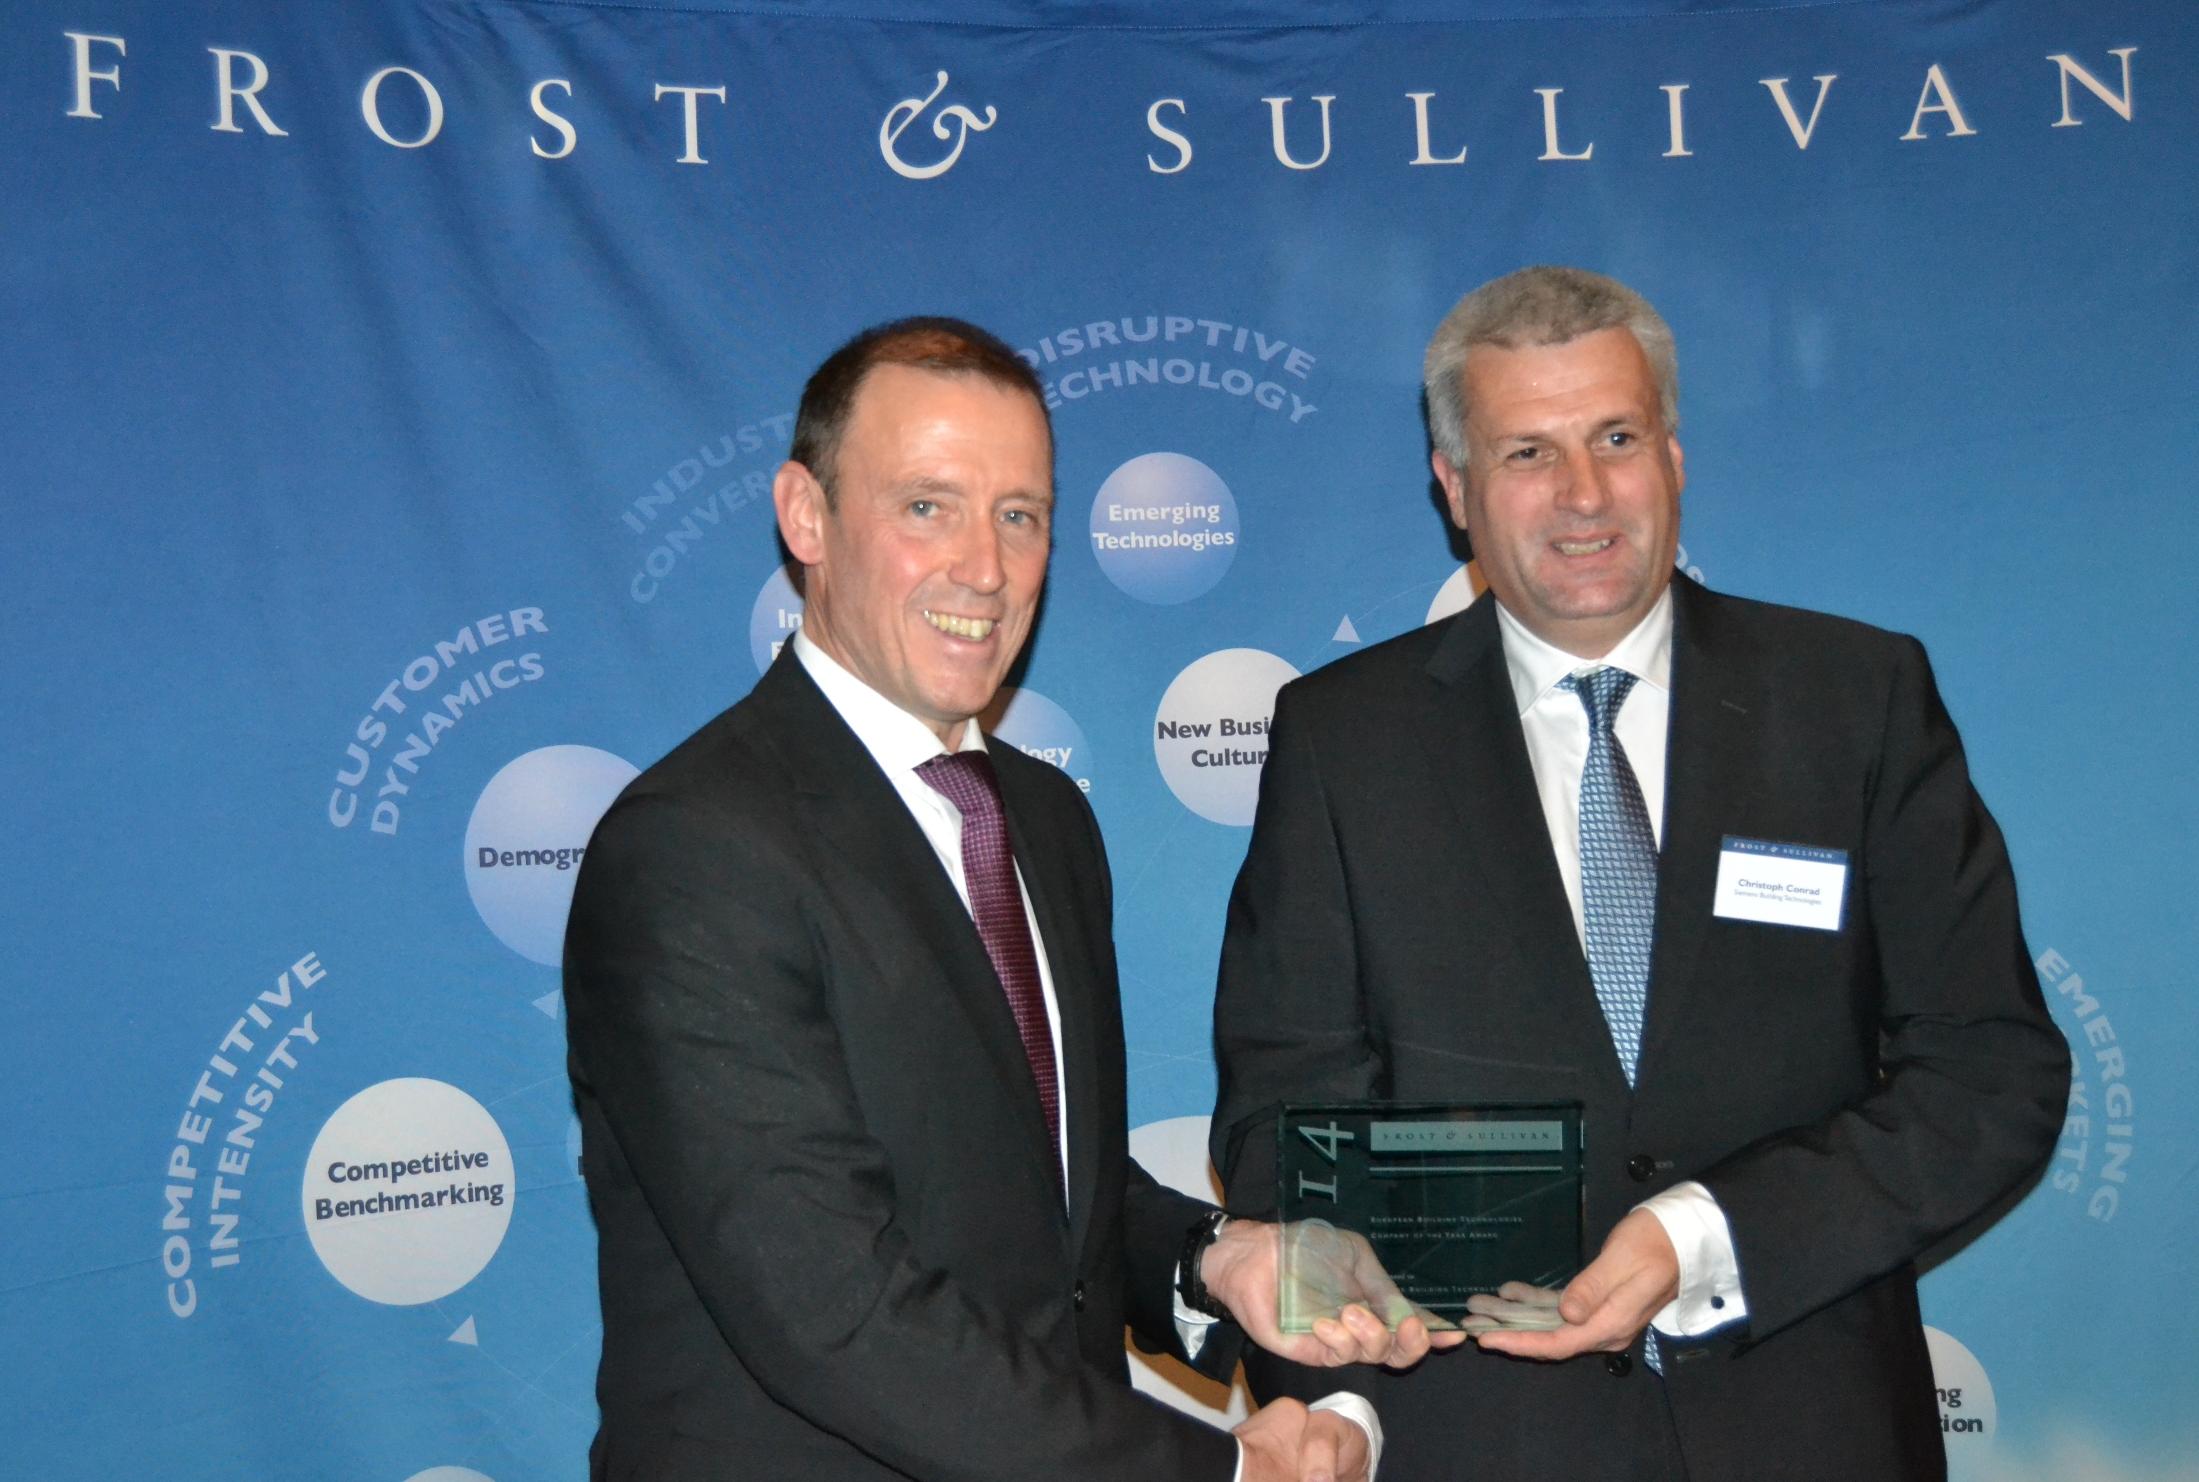 Frost_and_Sullivan_Award_2014_BT